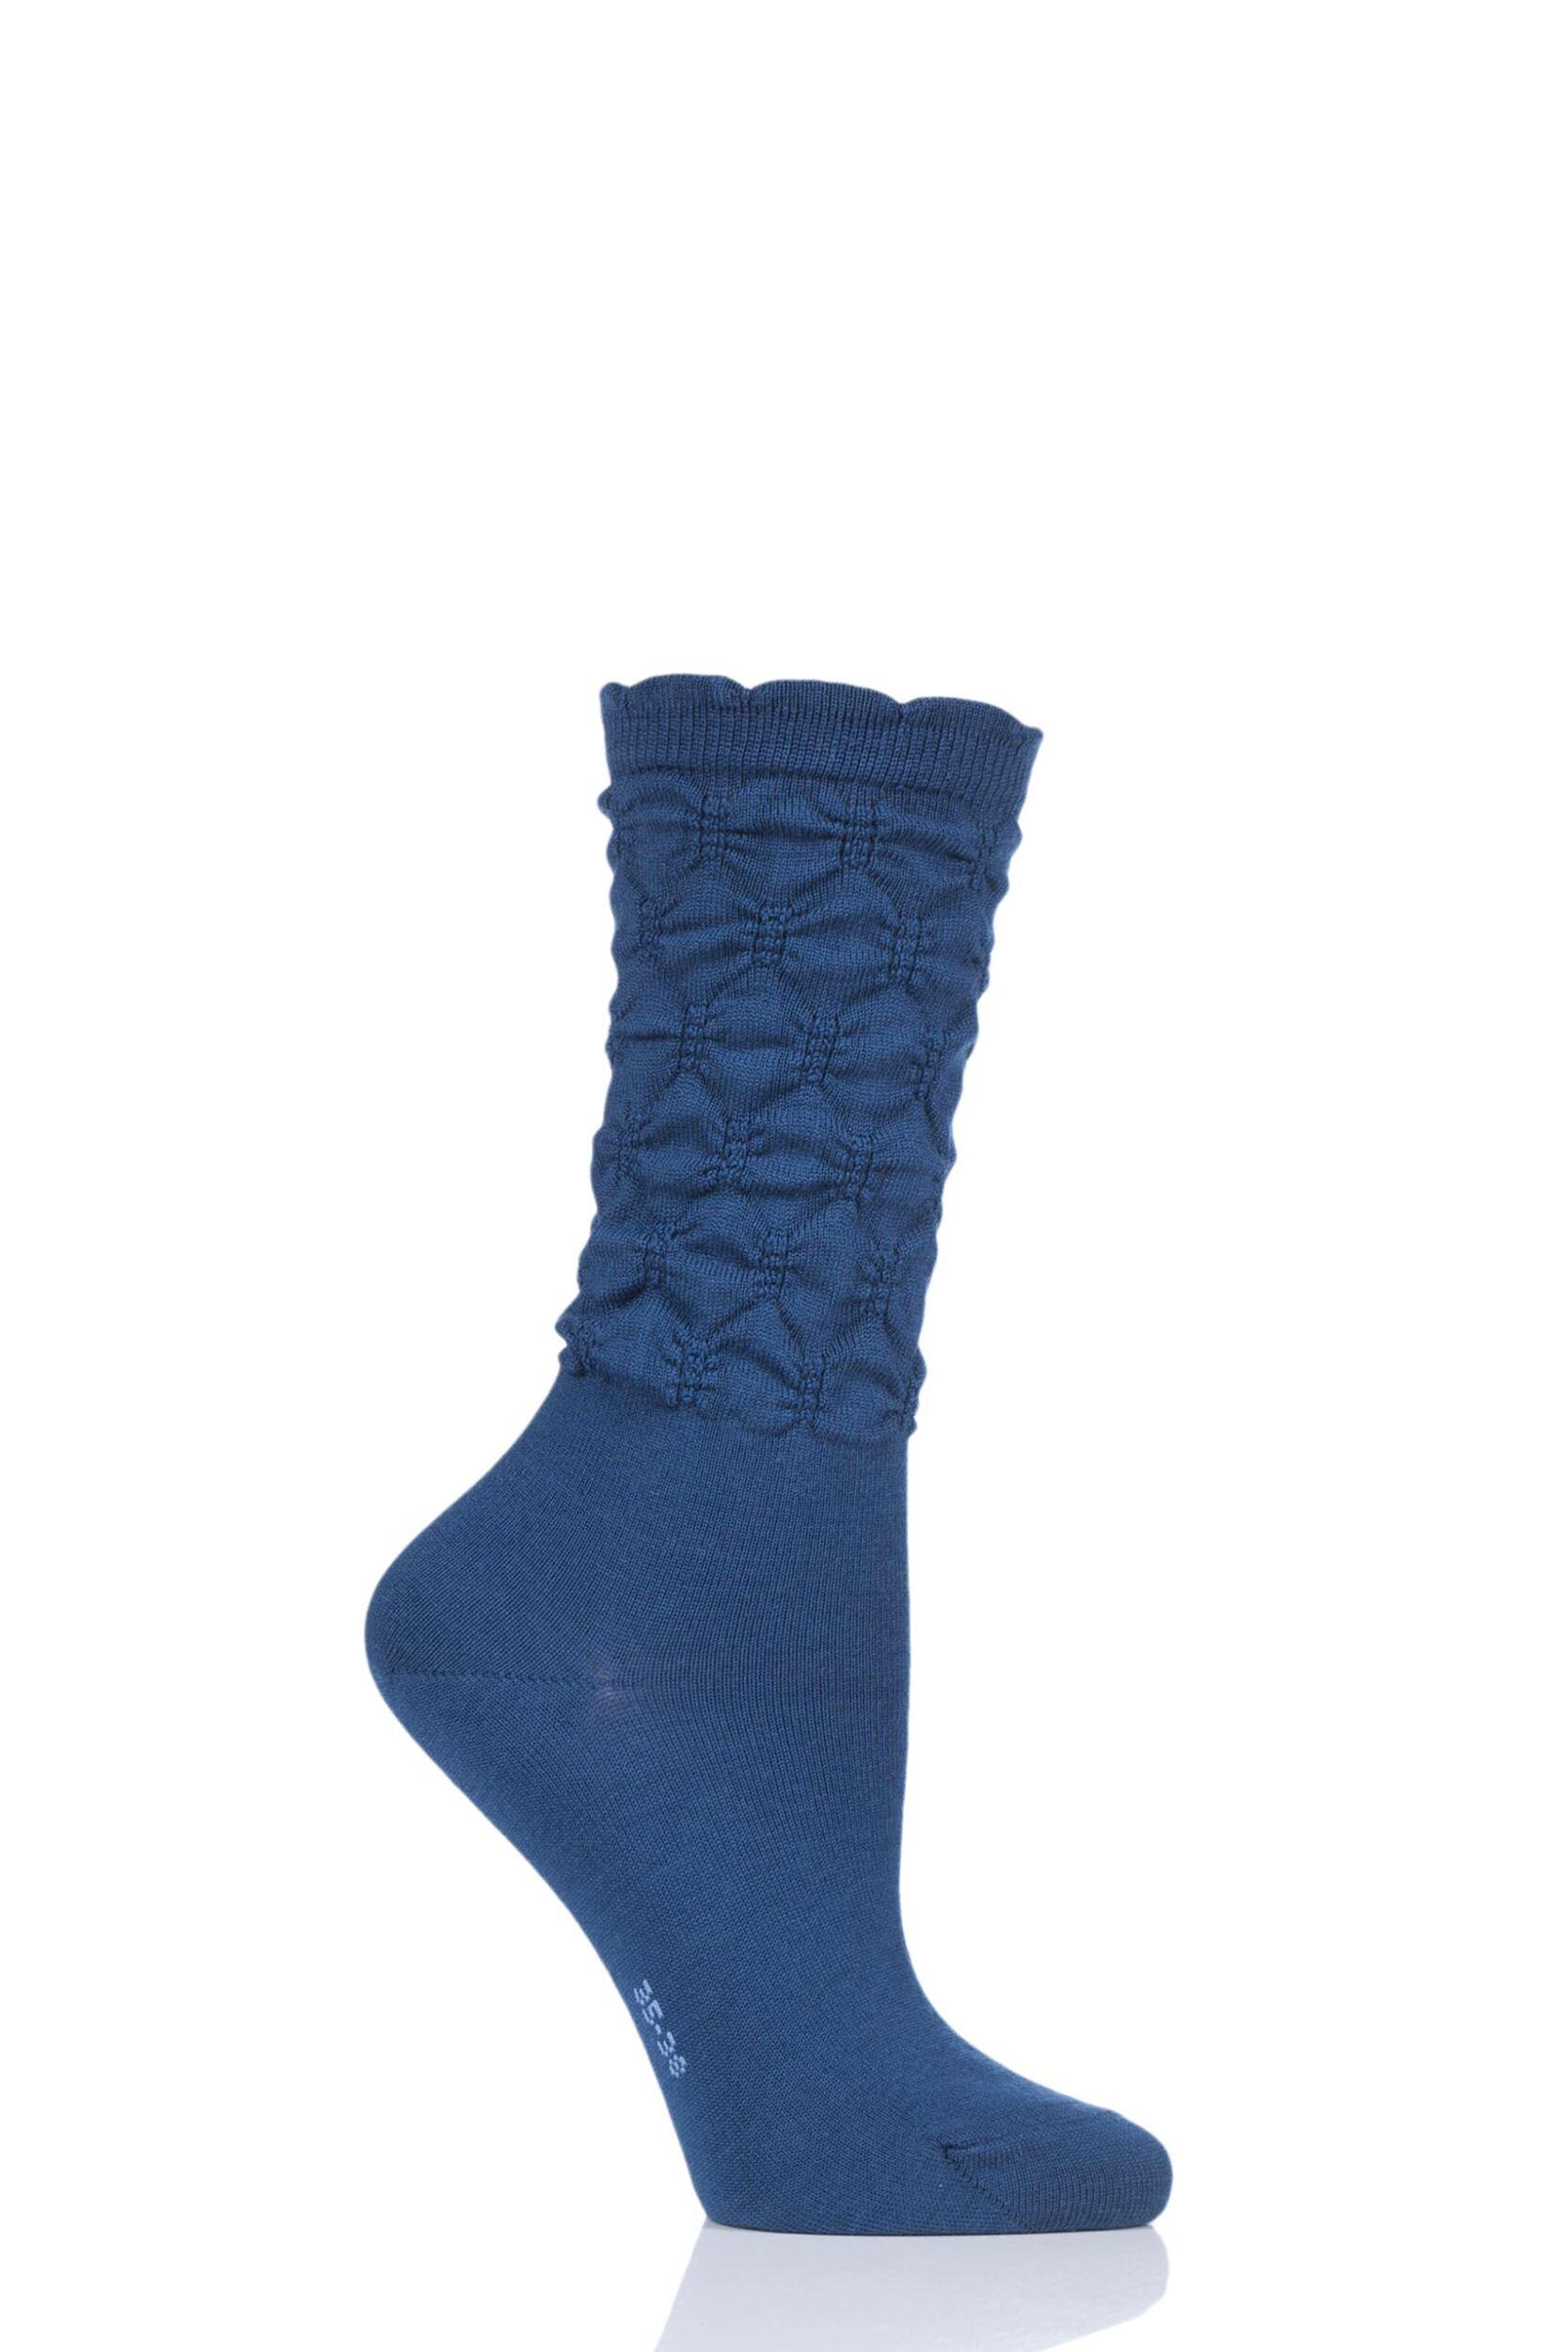 1 pair night sky crumpled diamond rib virgin wool socks ladies 2.5-5 ladies - falke